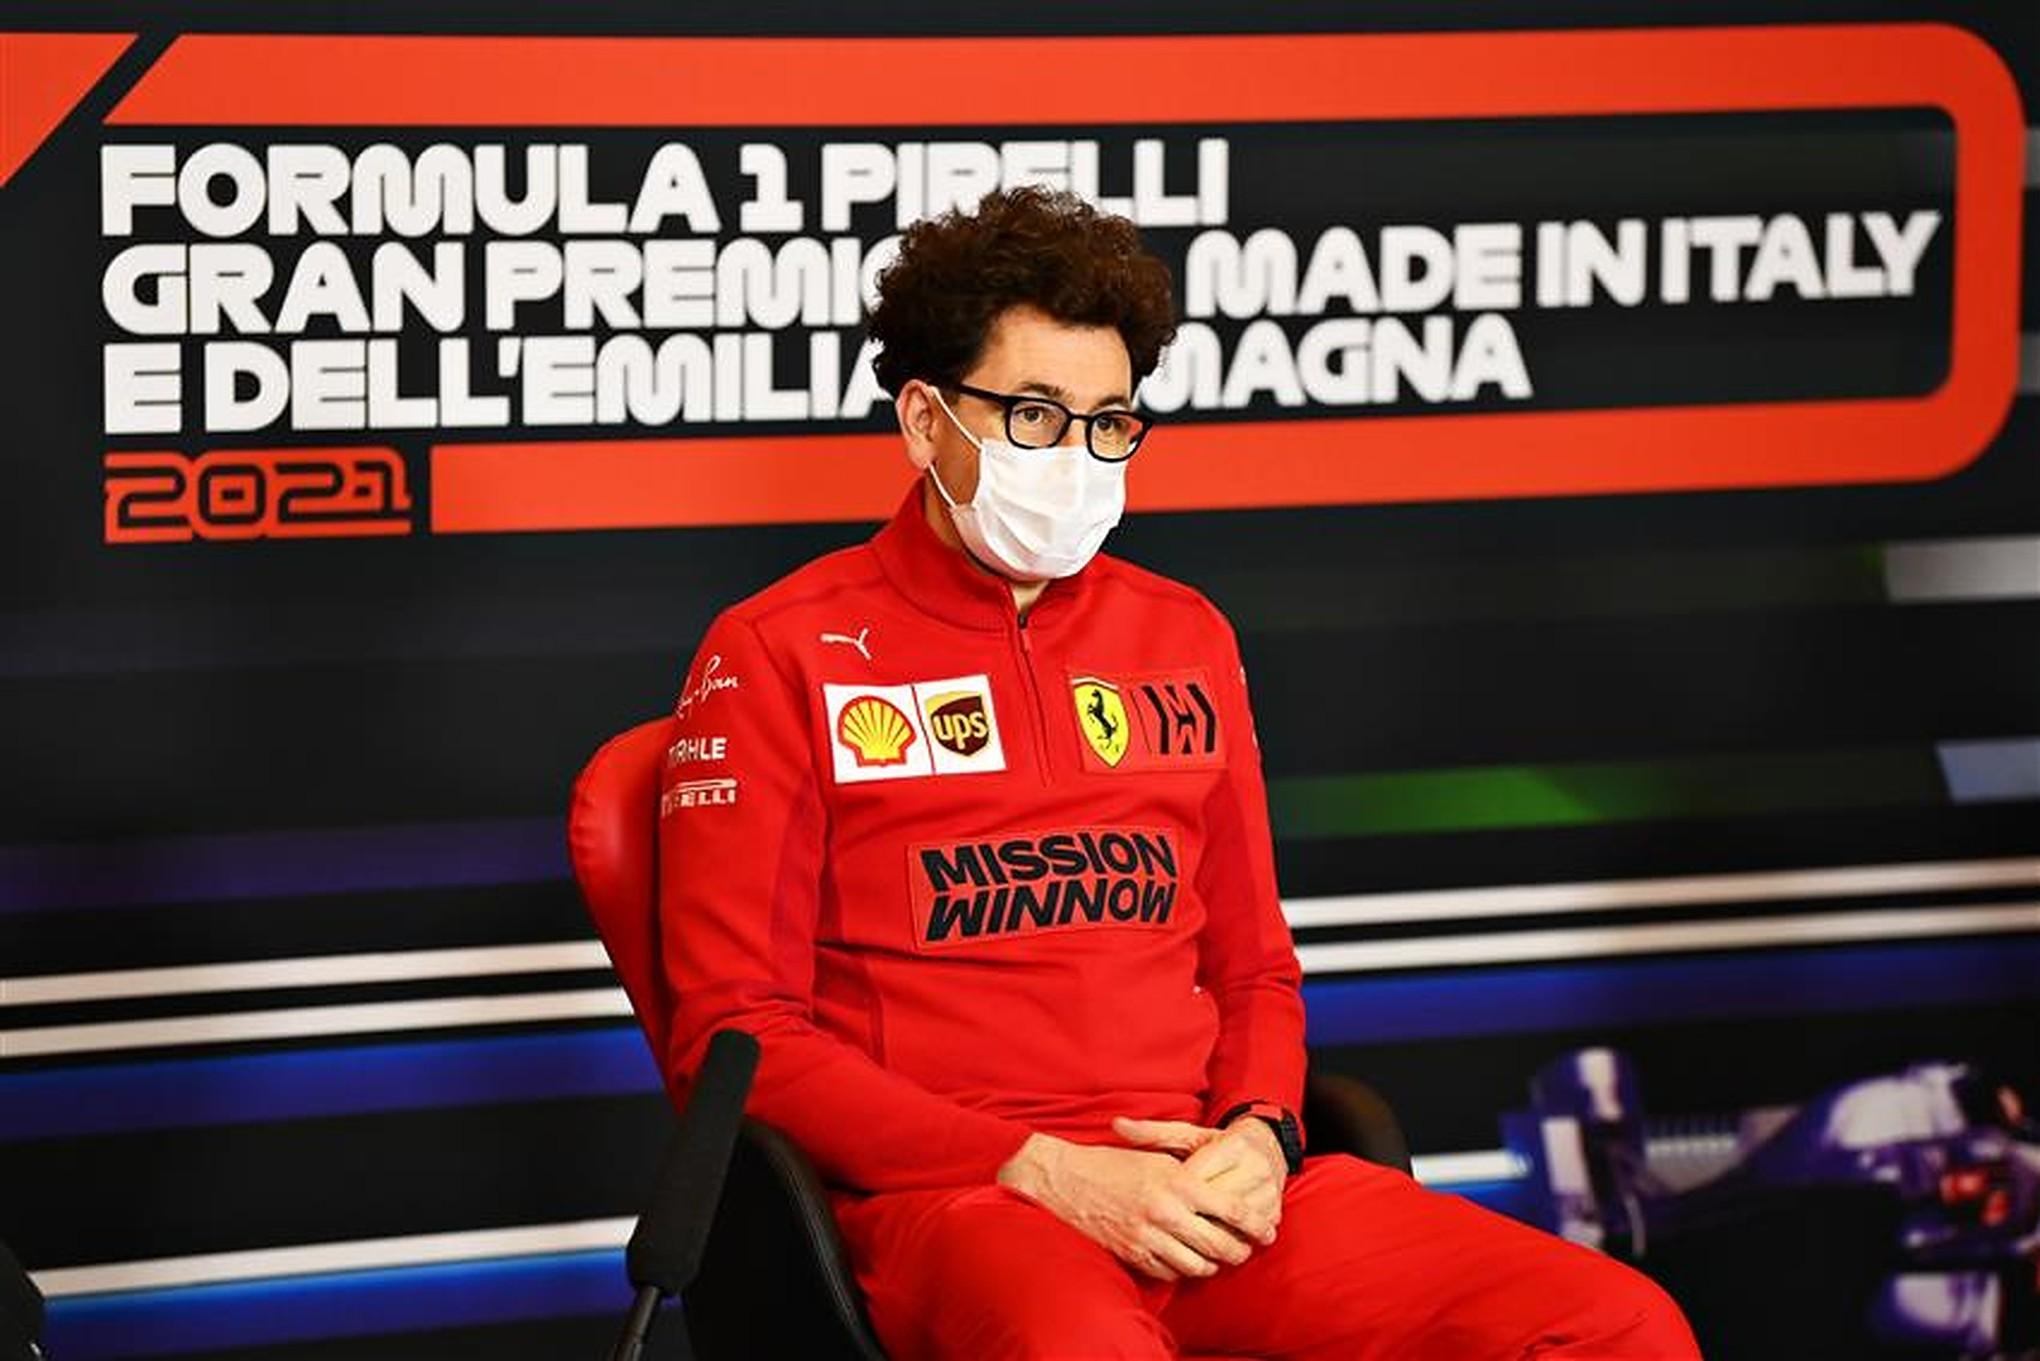 Ferrari team principal Mattia Binotto at Imola in 2021 - Formula1news.co.uk